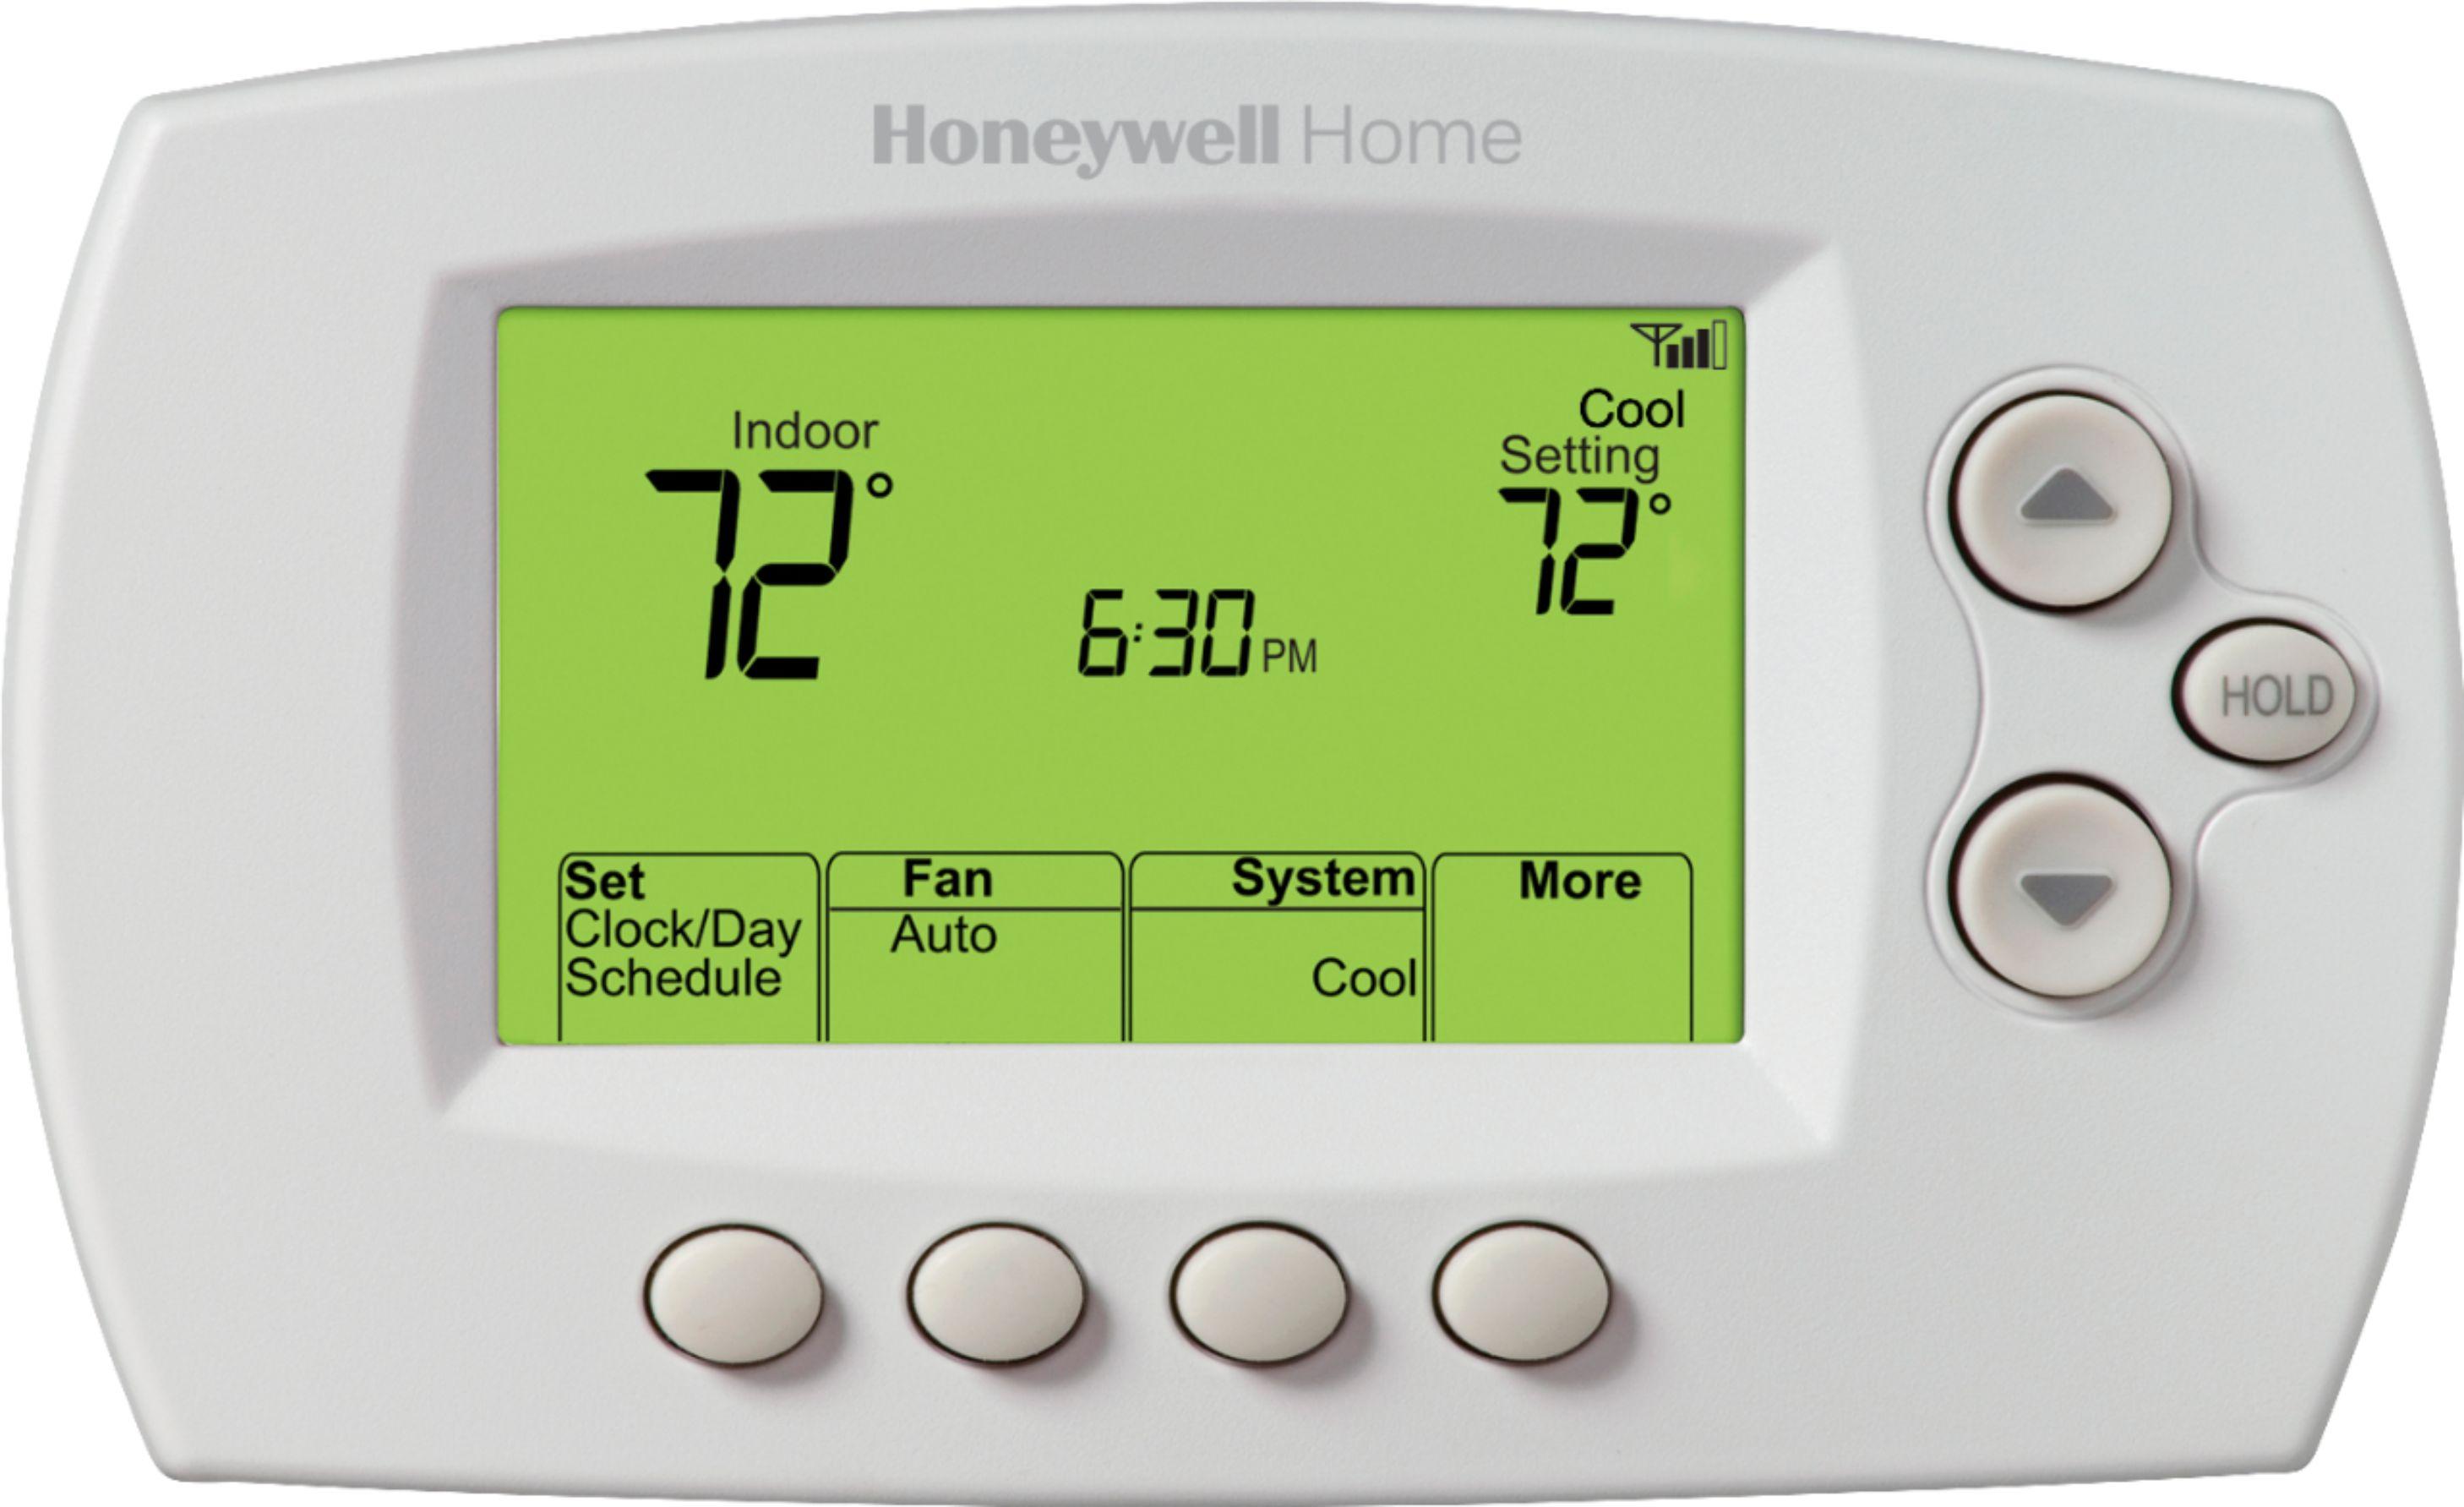 honeywell thermostat rth221b1000 wiring diagram krone rj11 socket rth7500d kitchen dining room layout